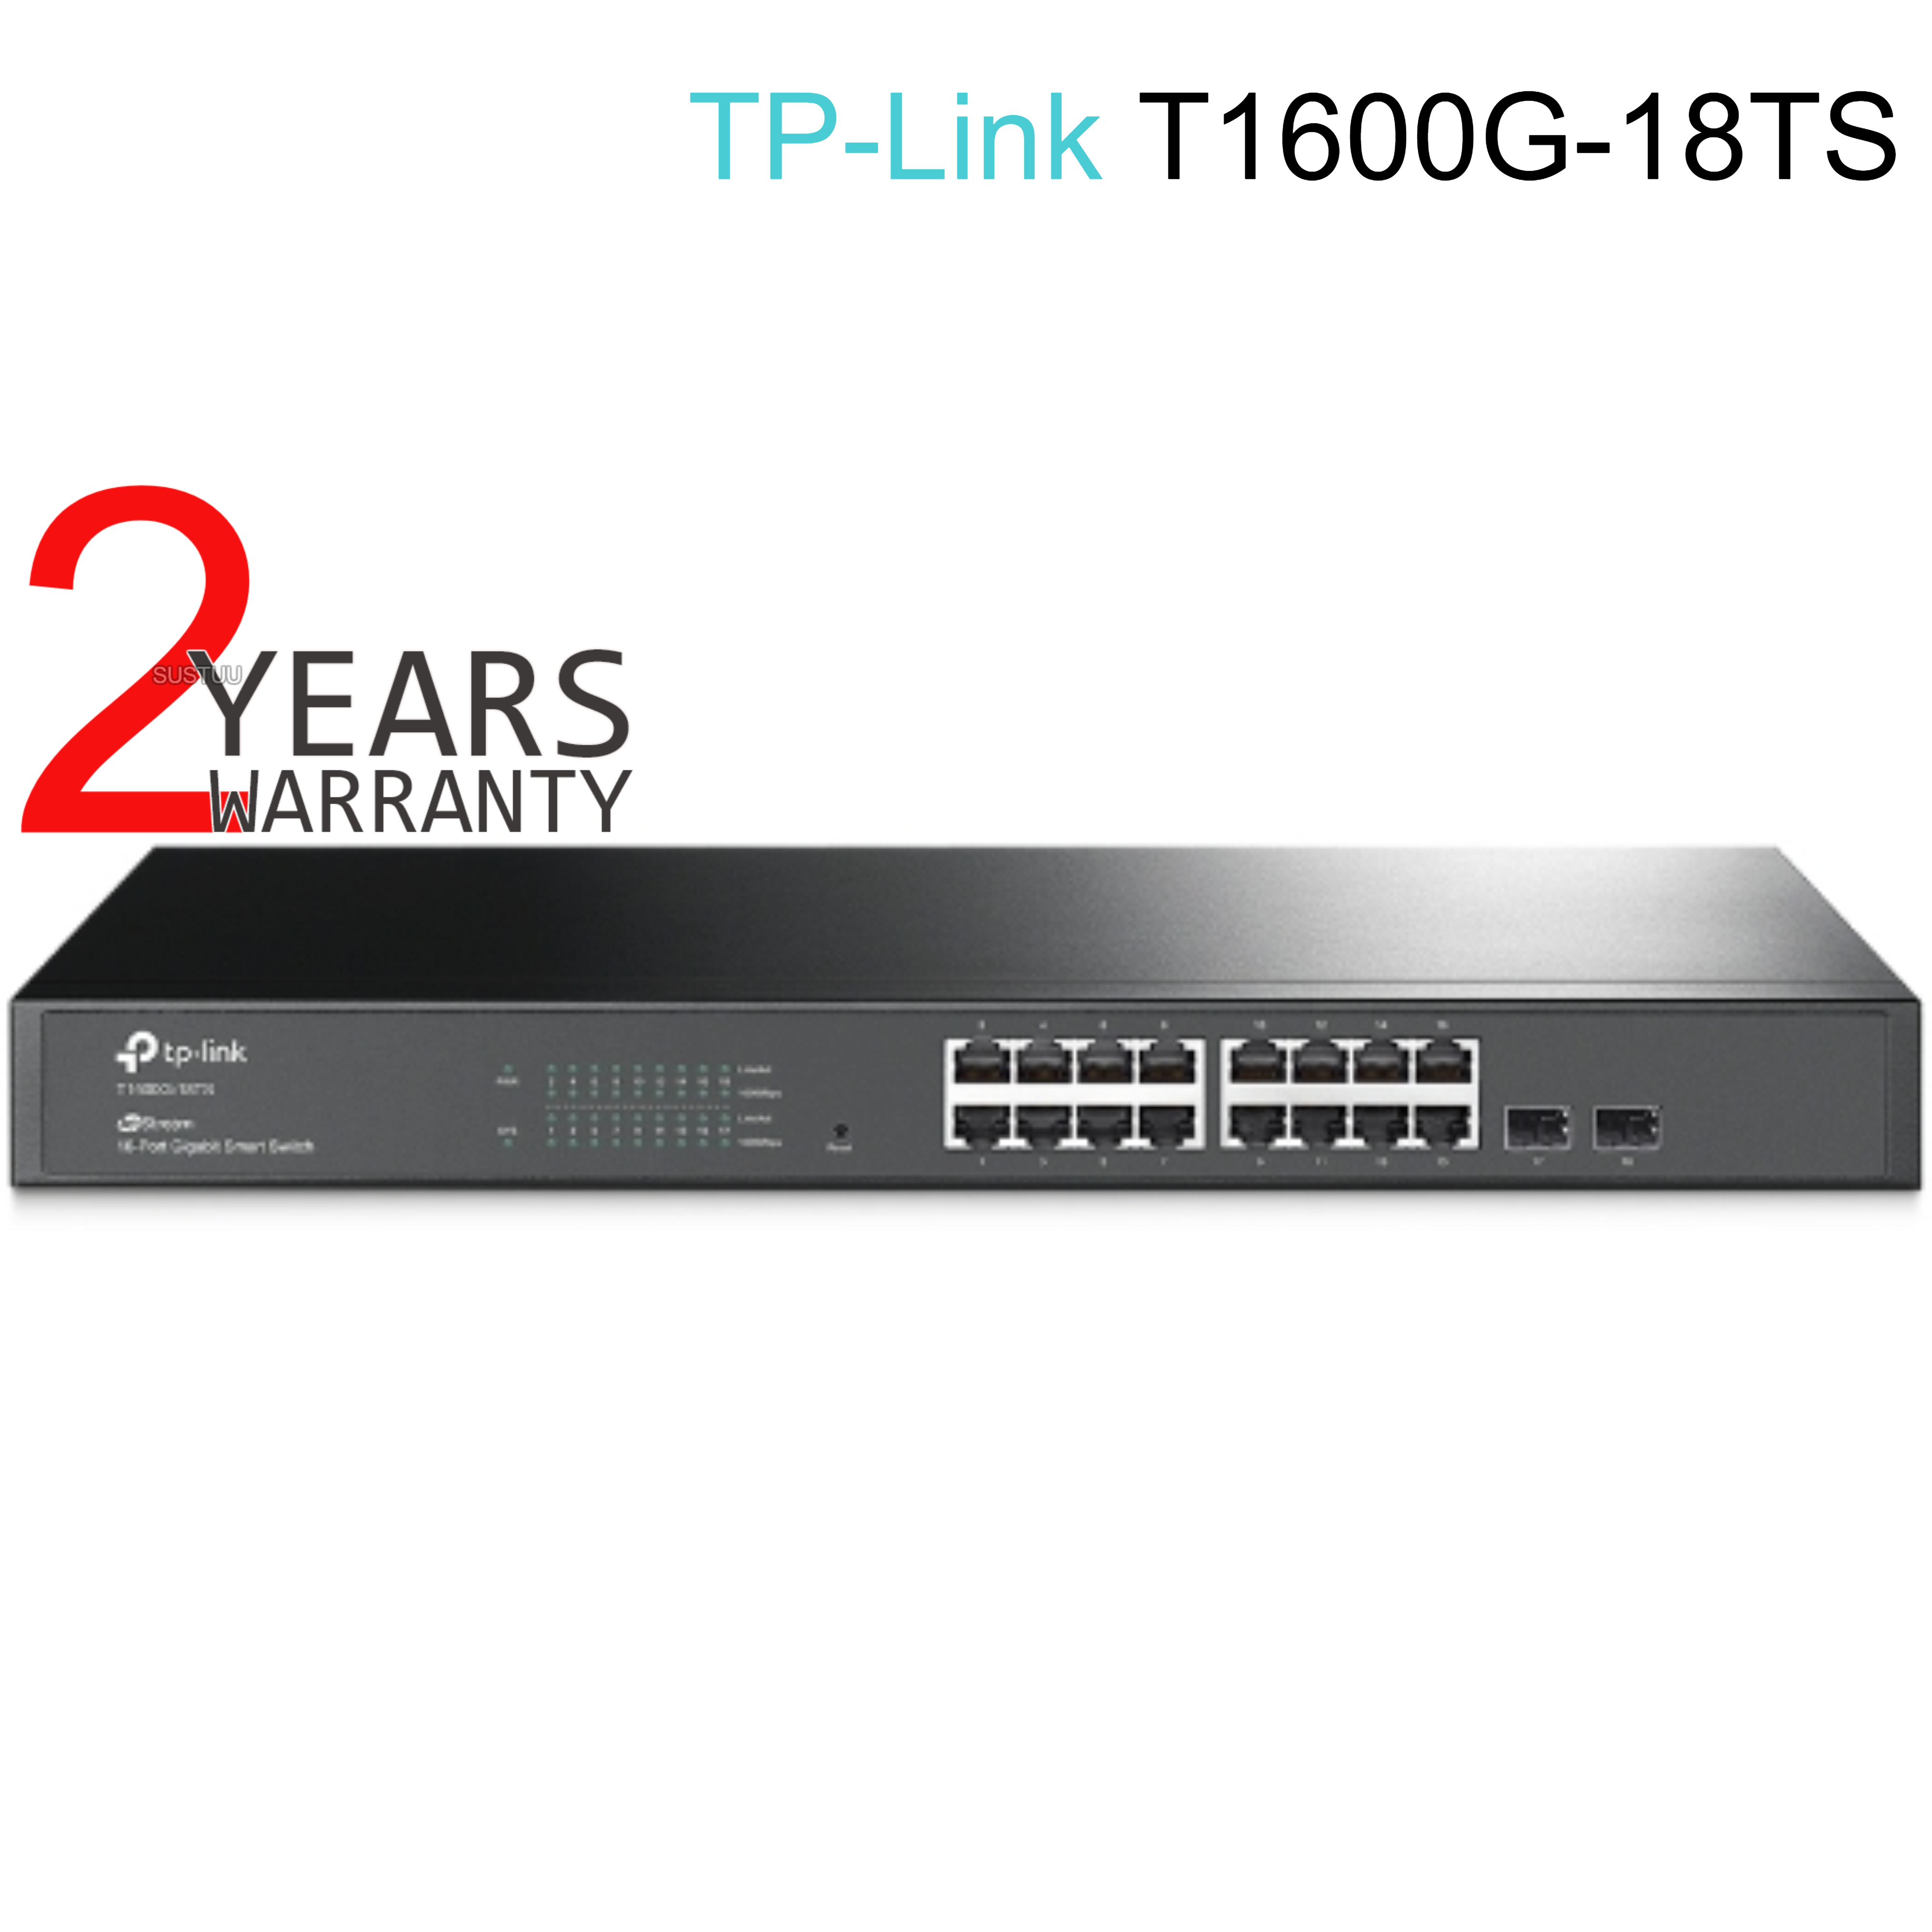 TP-Link T1600G-18TS|JetStream16-Port Gigabit Smart Switch with 2 SFP Slot|IPv6 Support